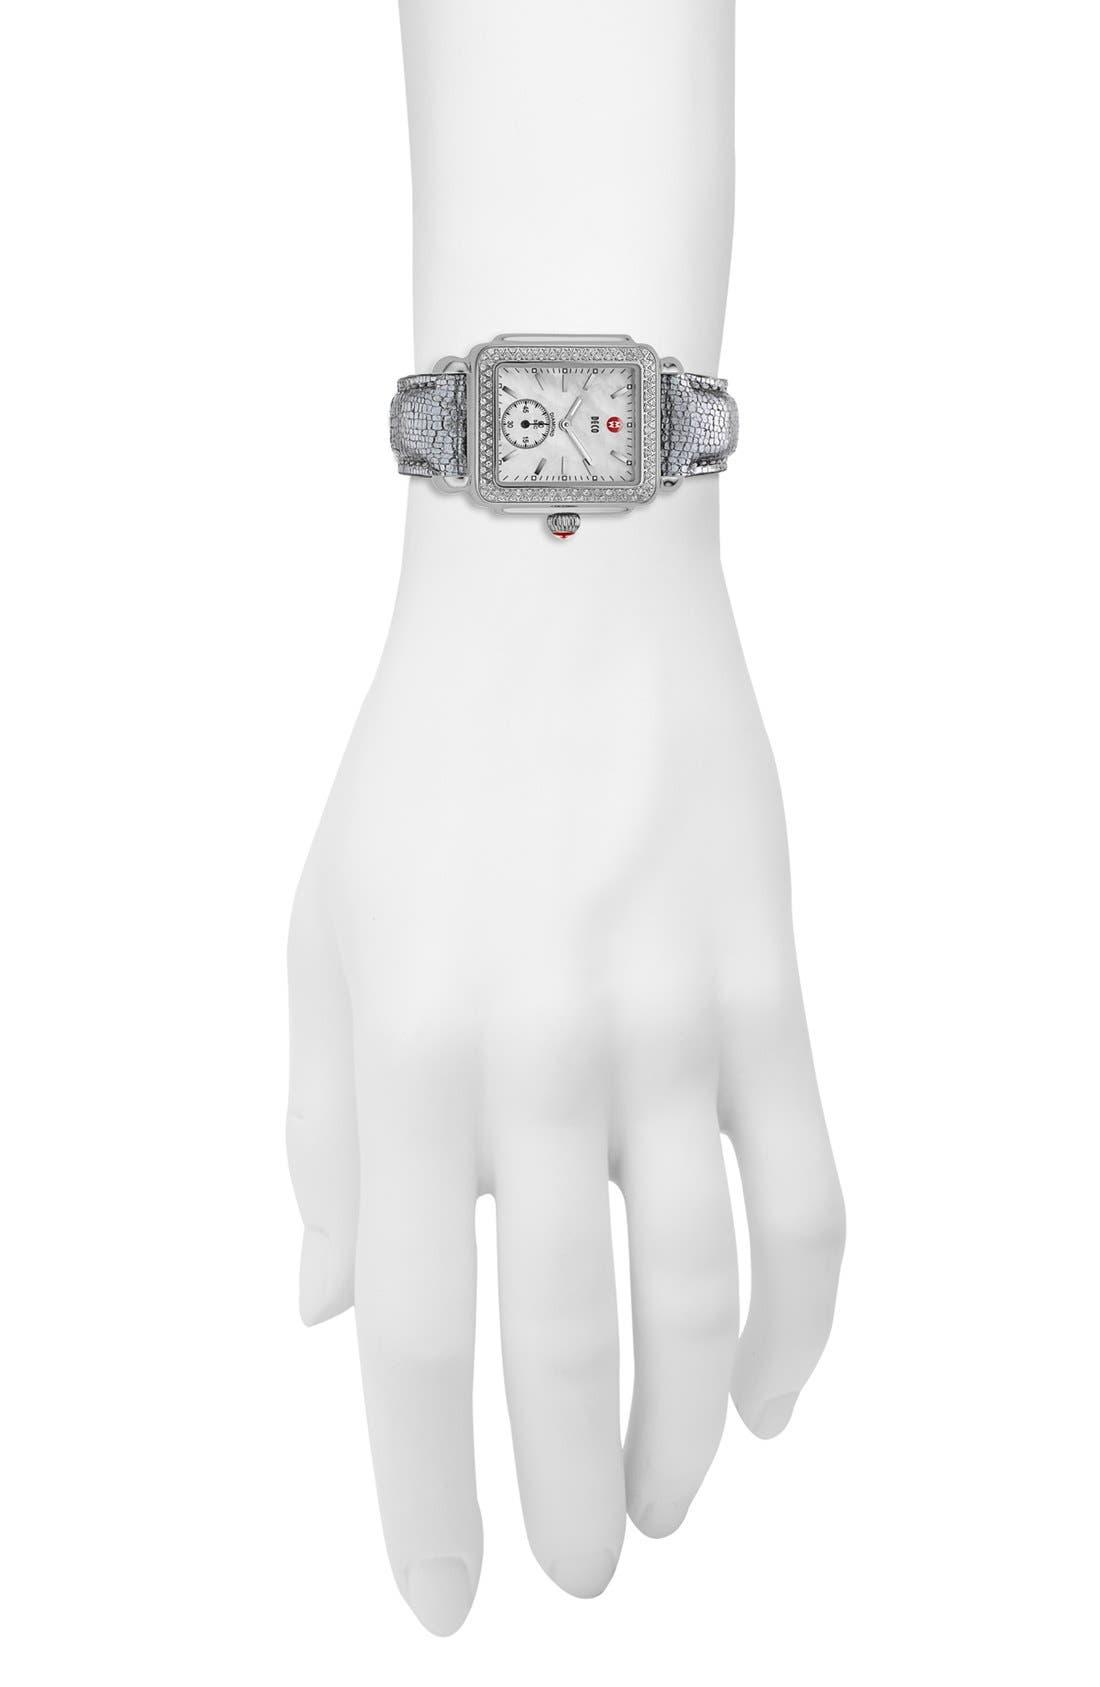 MICHELE, Deco 16 Diamond Watch Head, 29mm x 31mm, Alternate thumbnail 7, color, SILVER